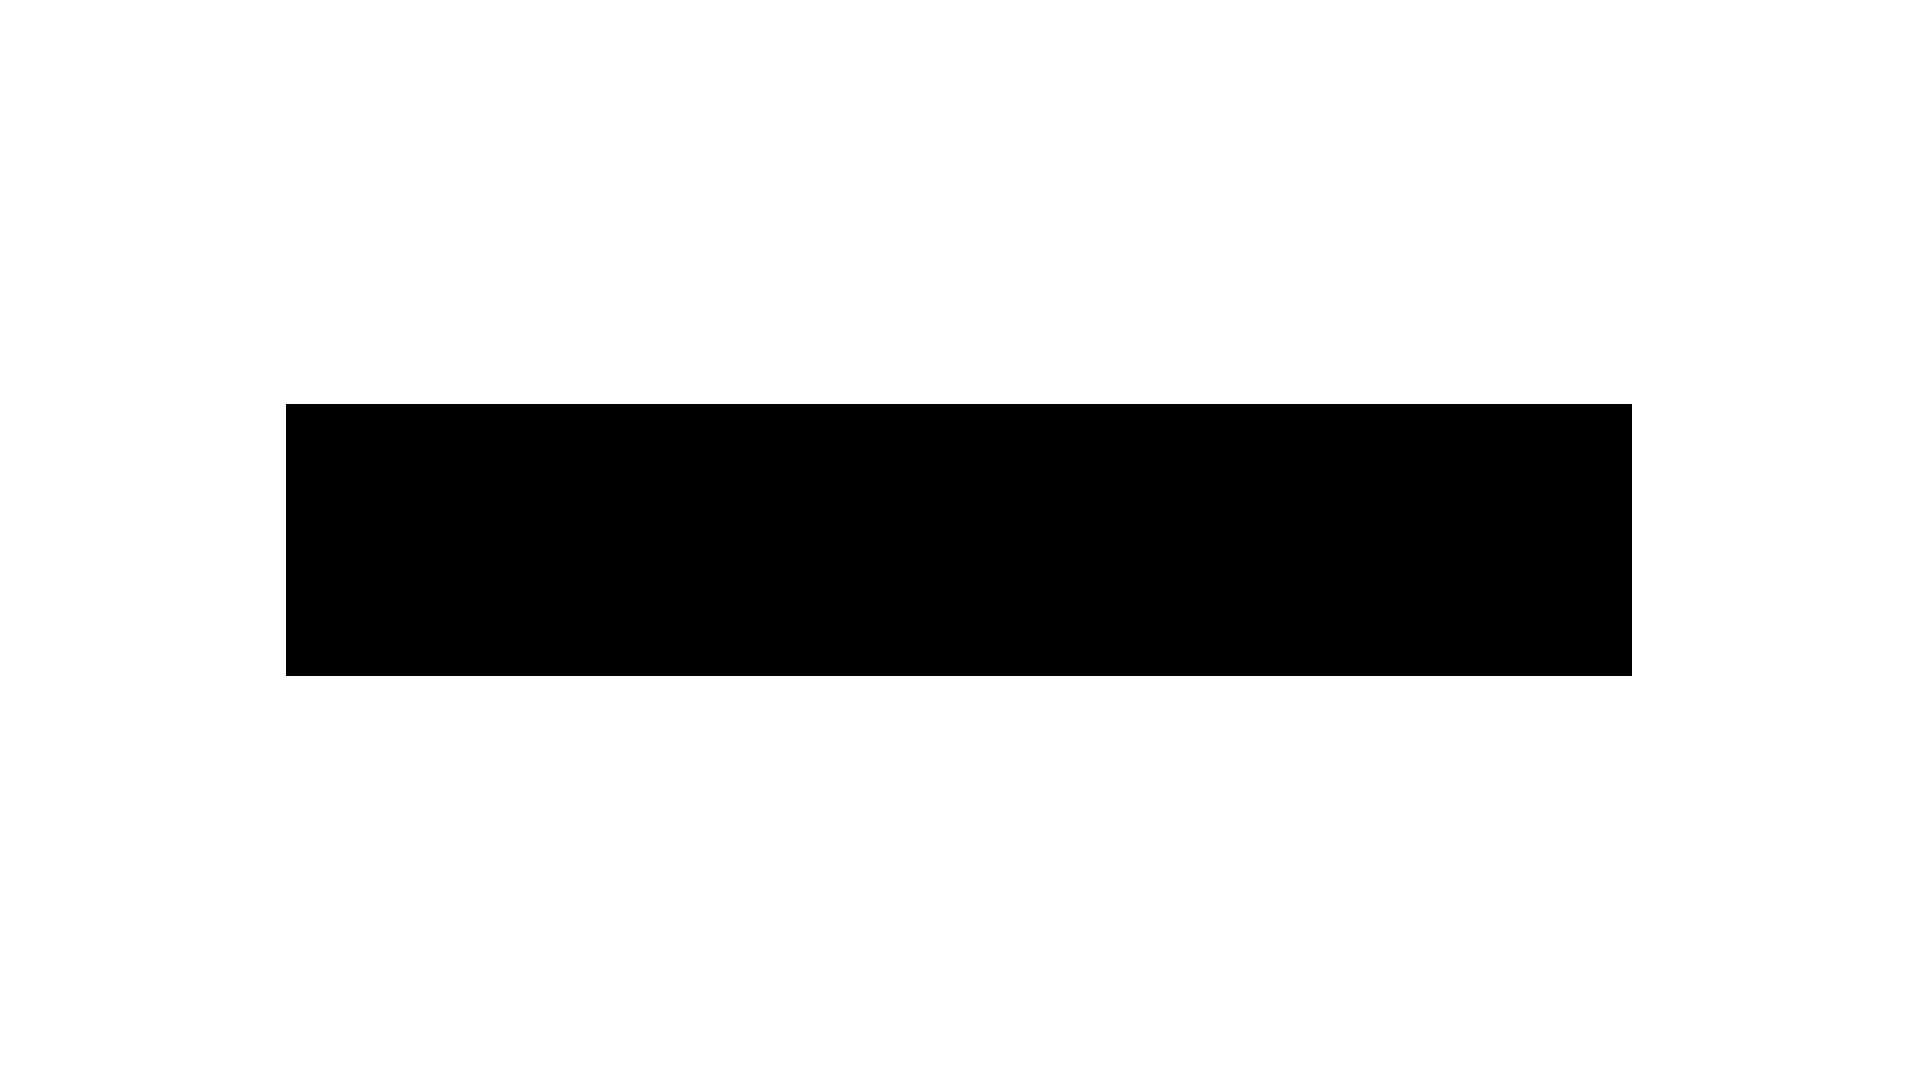 taela 01 v2